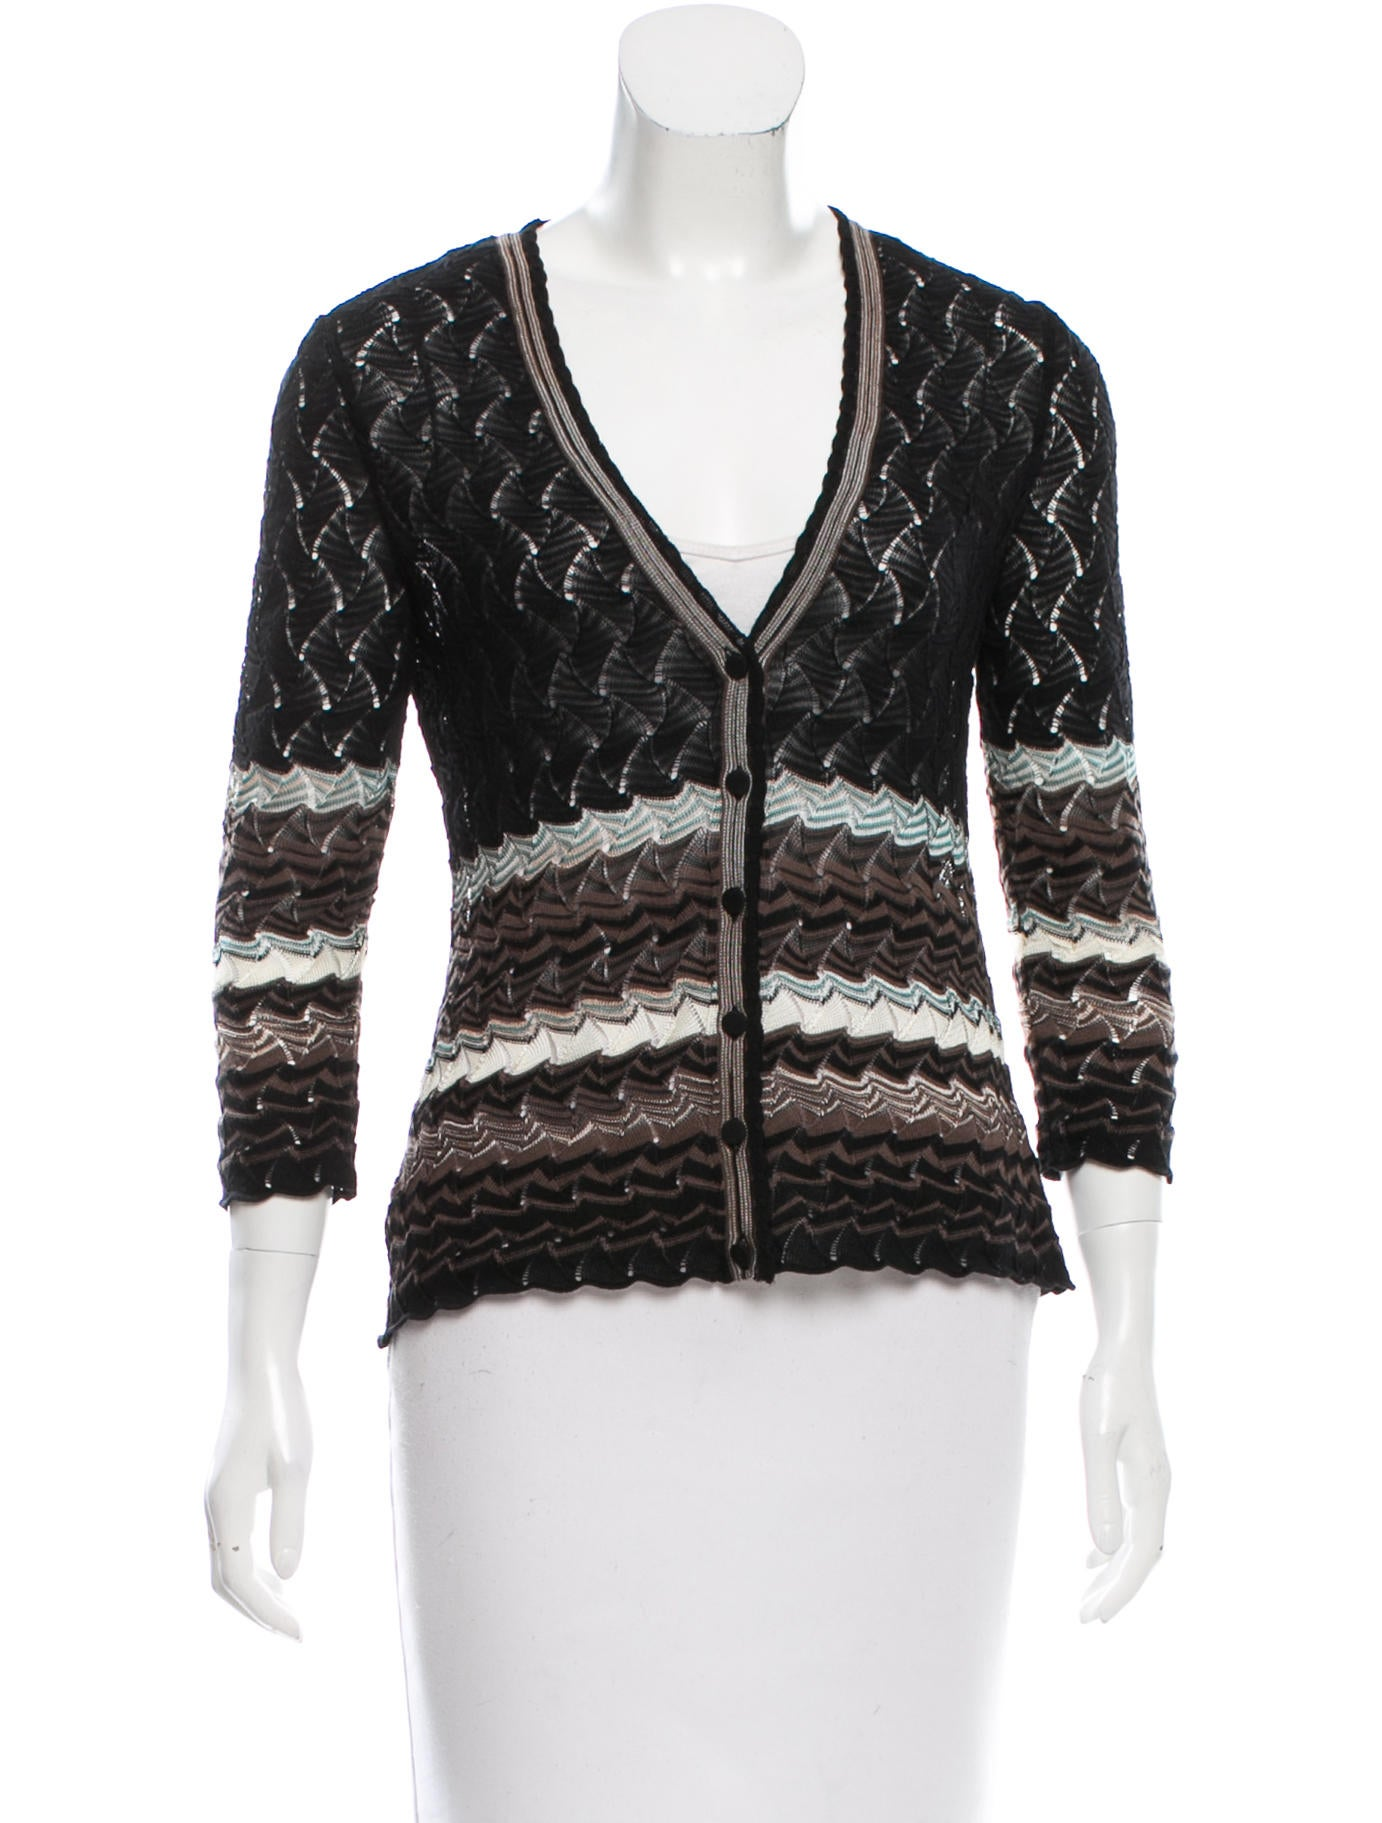 Knitting Pattern Striped Cardigan : M Missoni Striped Knit Cardigan - Clothing - WM438359 ...